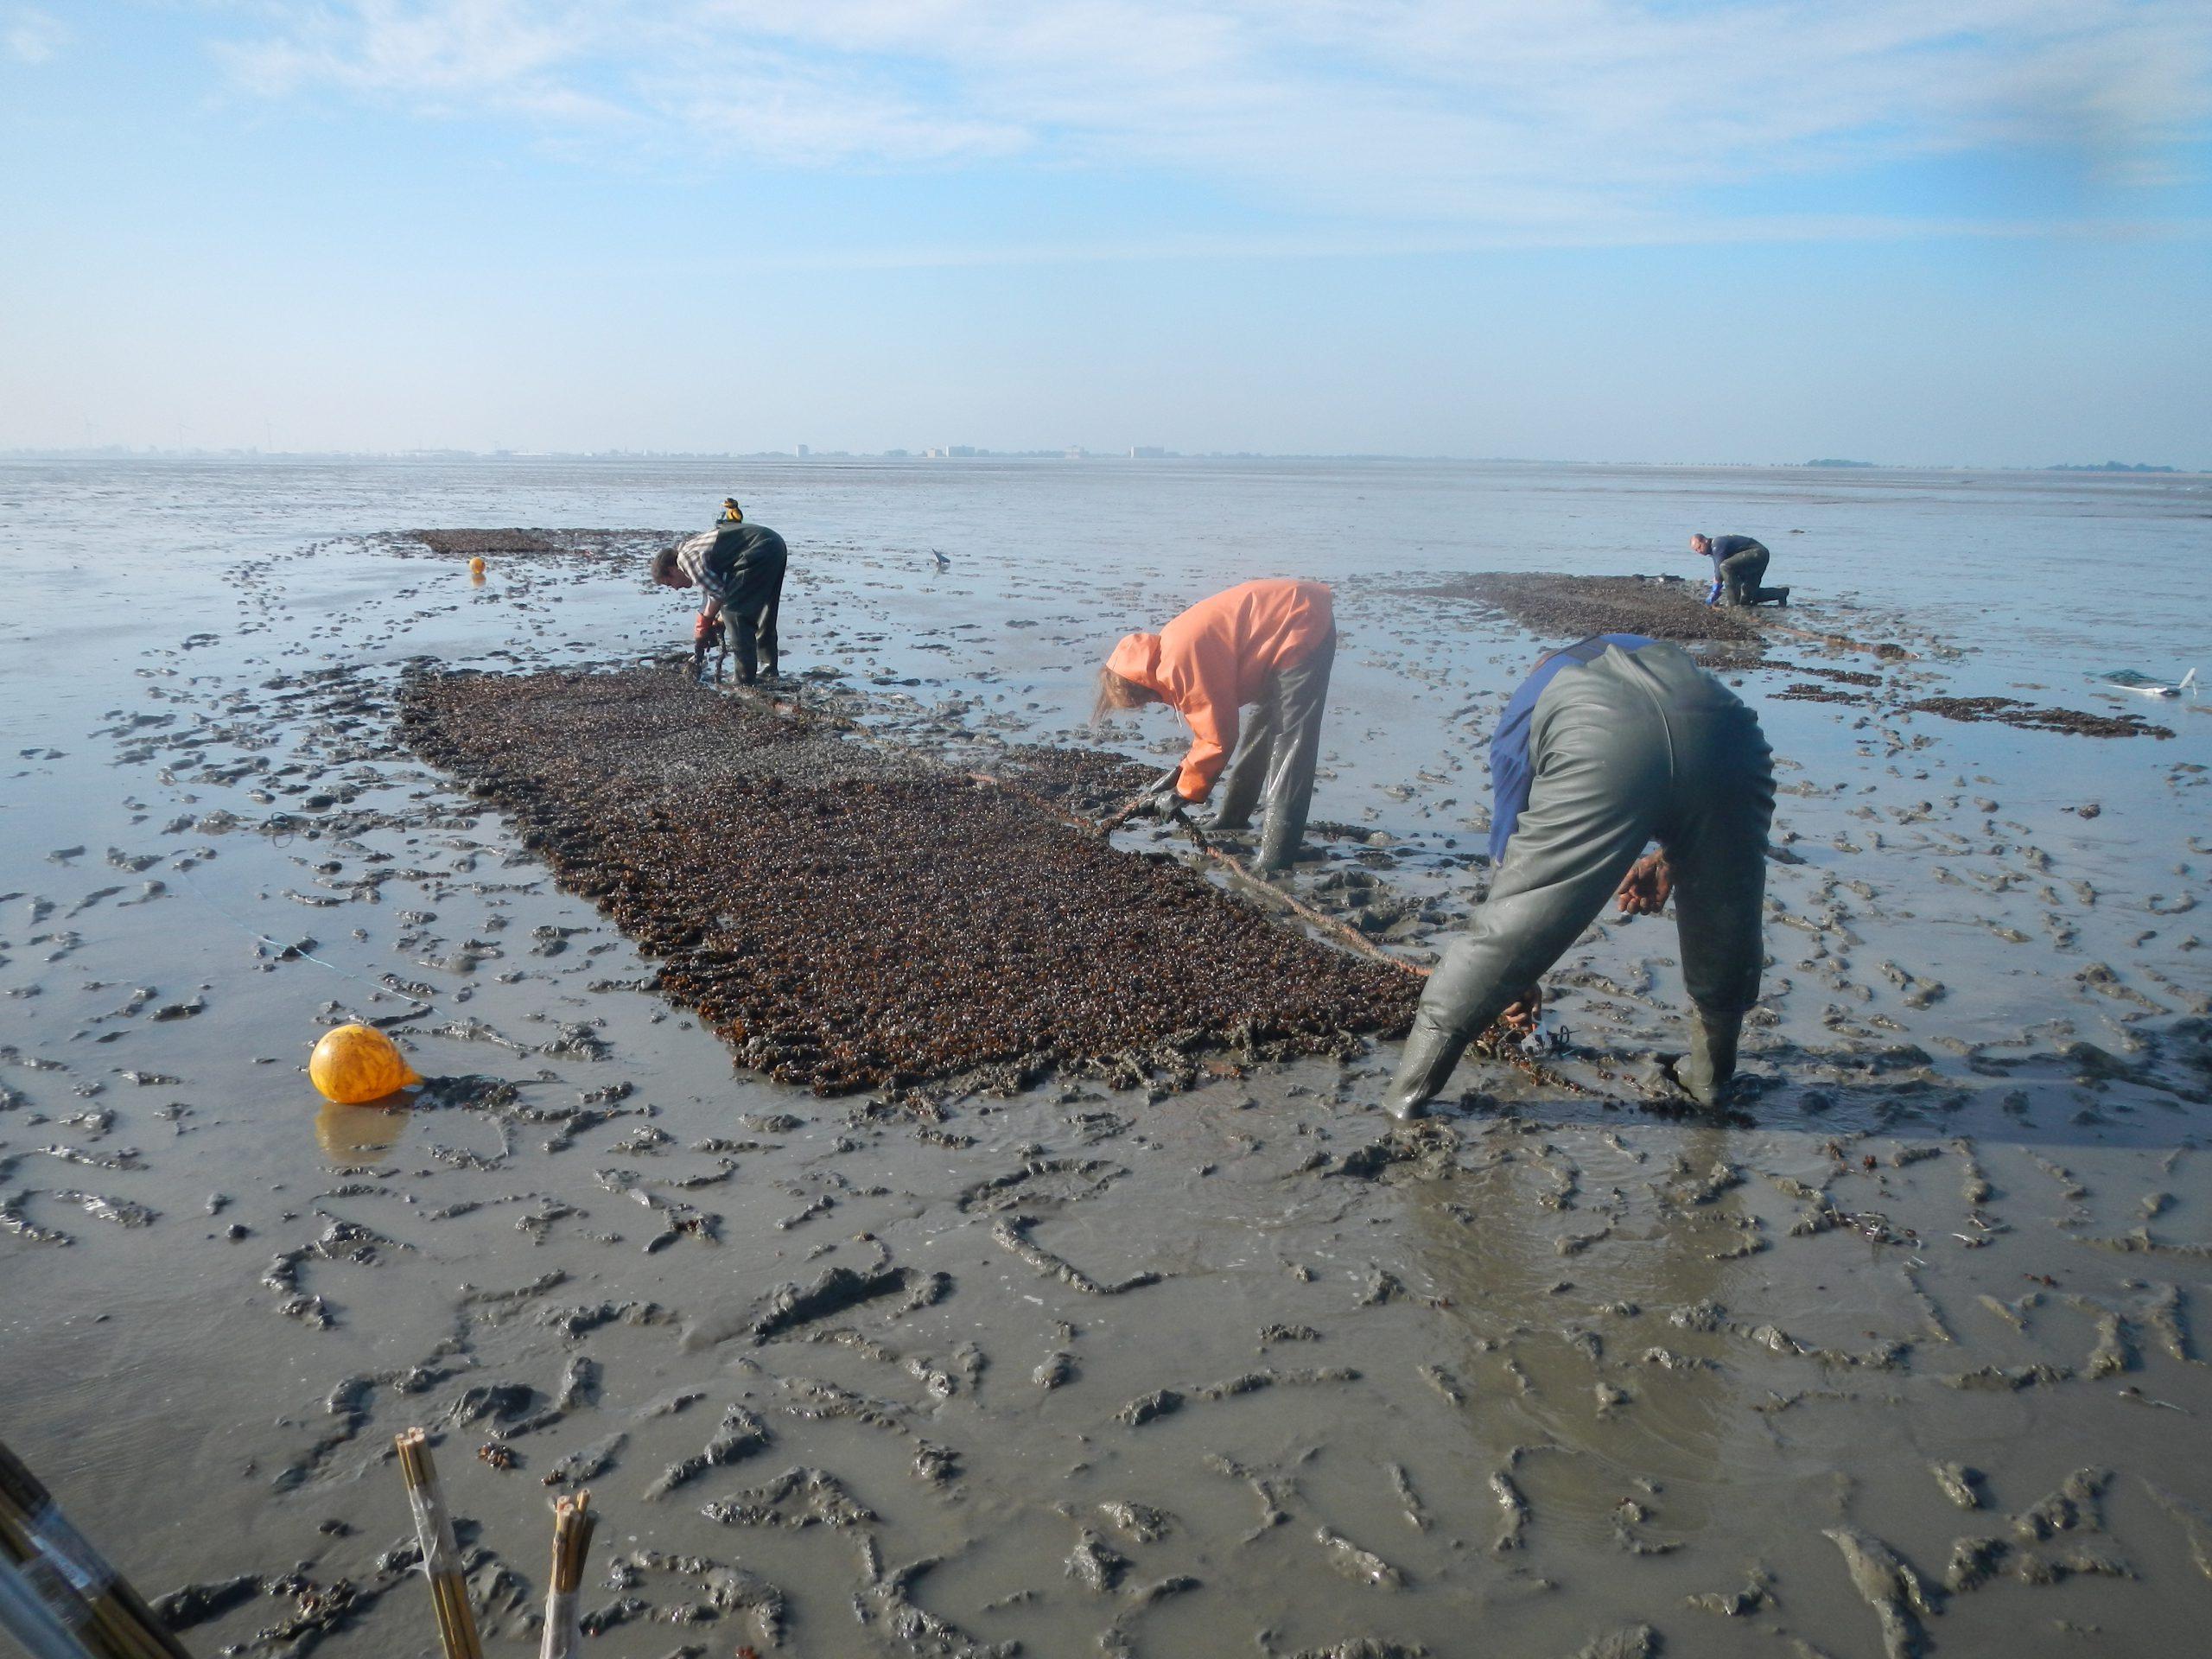 Aanleg mosselbank bij de Paap in de Waddenzee